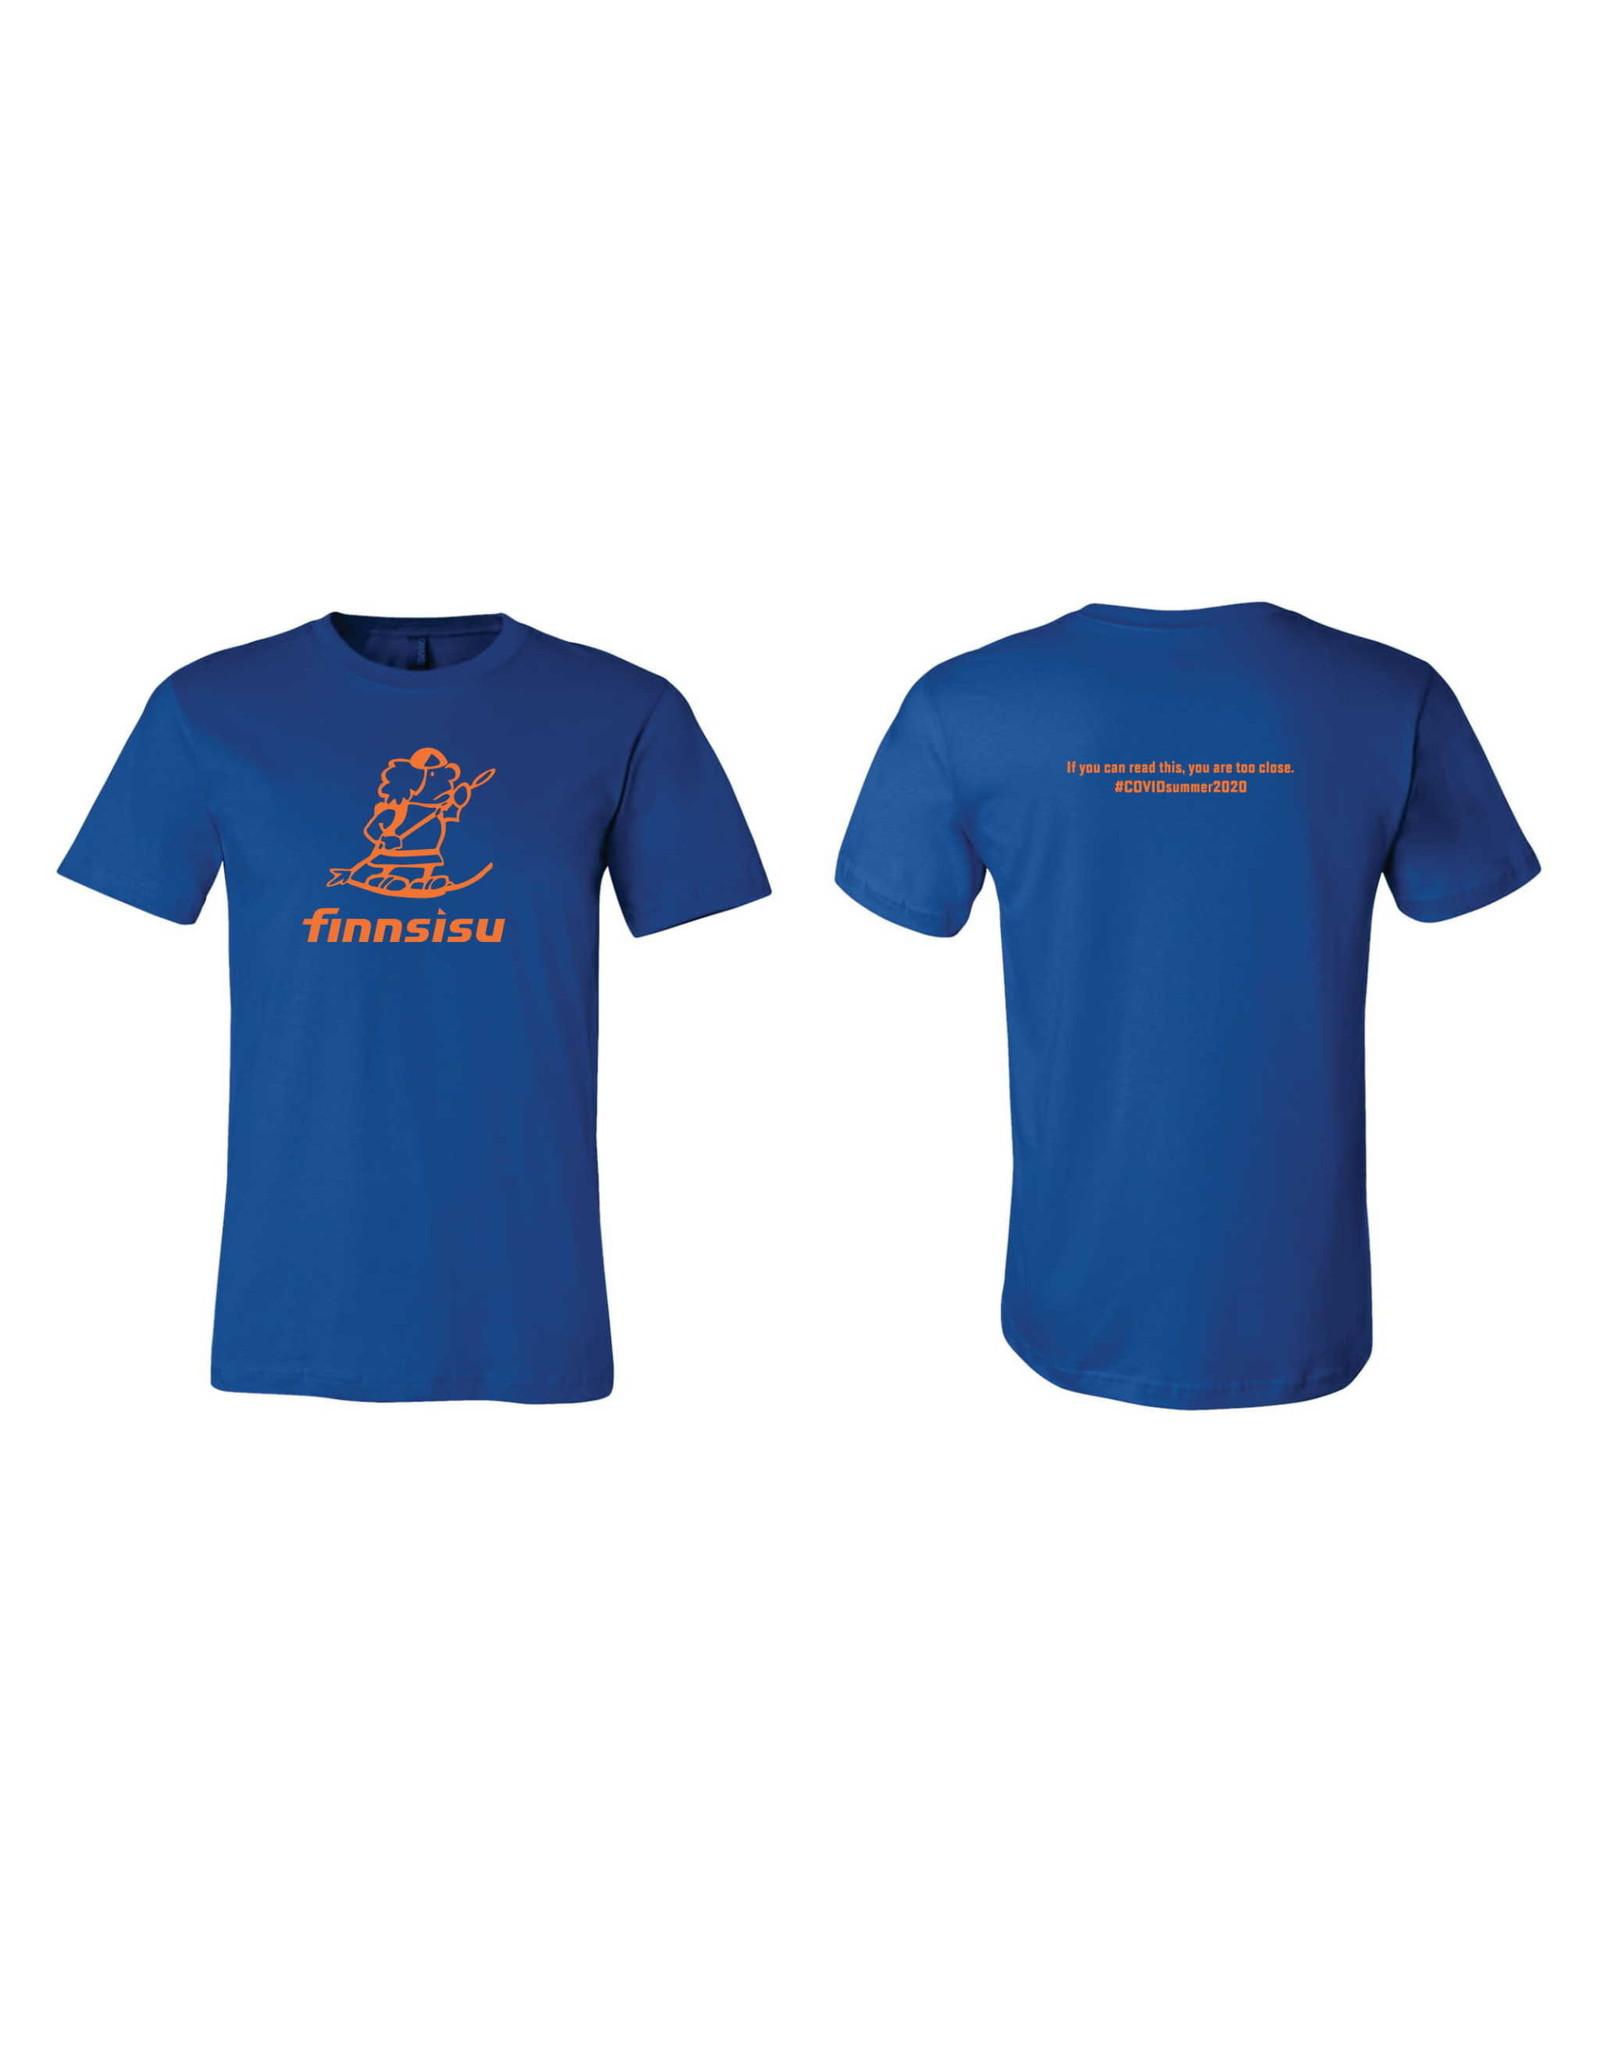 Finn Sisu Covid T Shirt - MEN